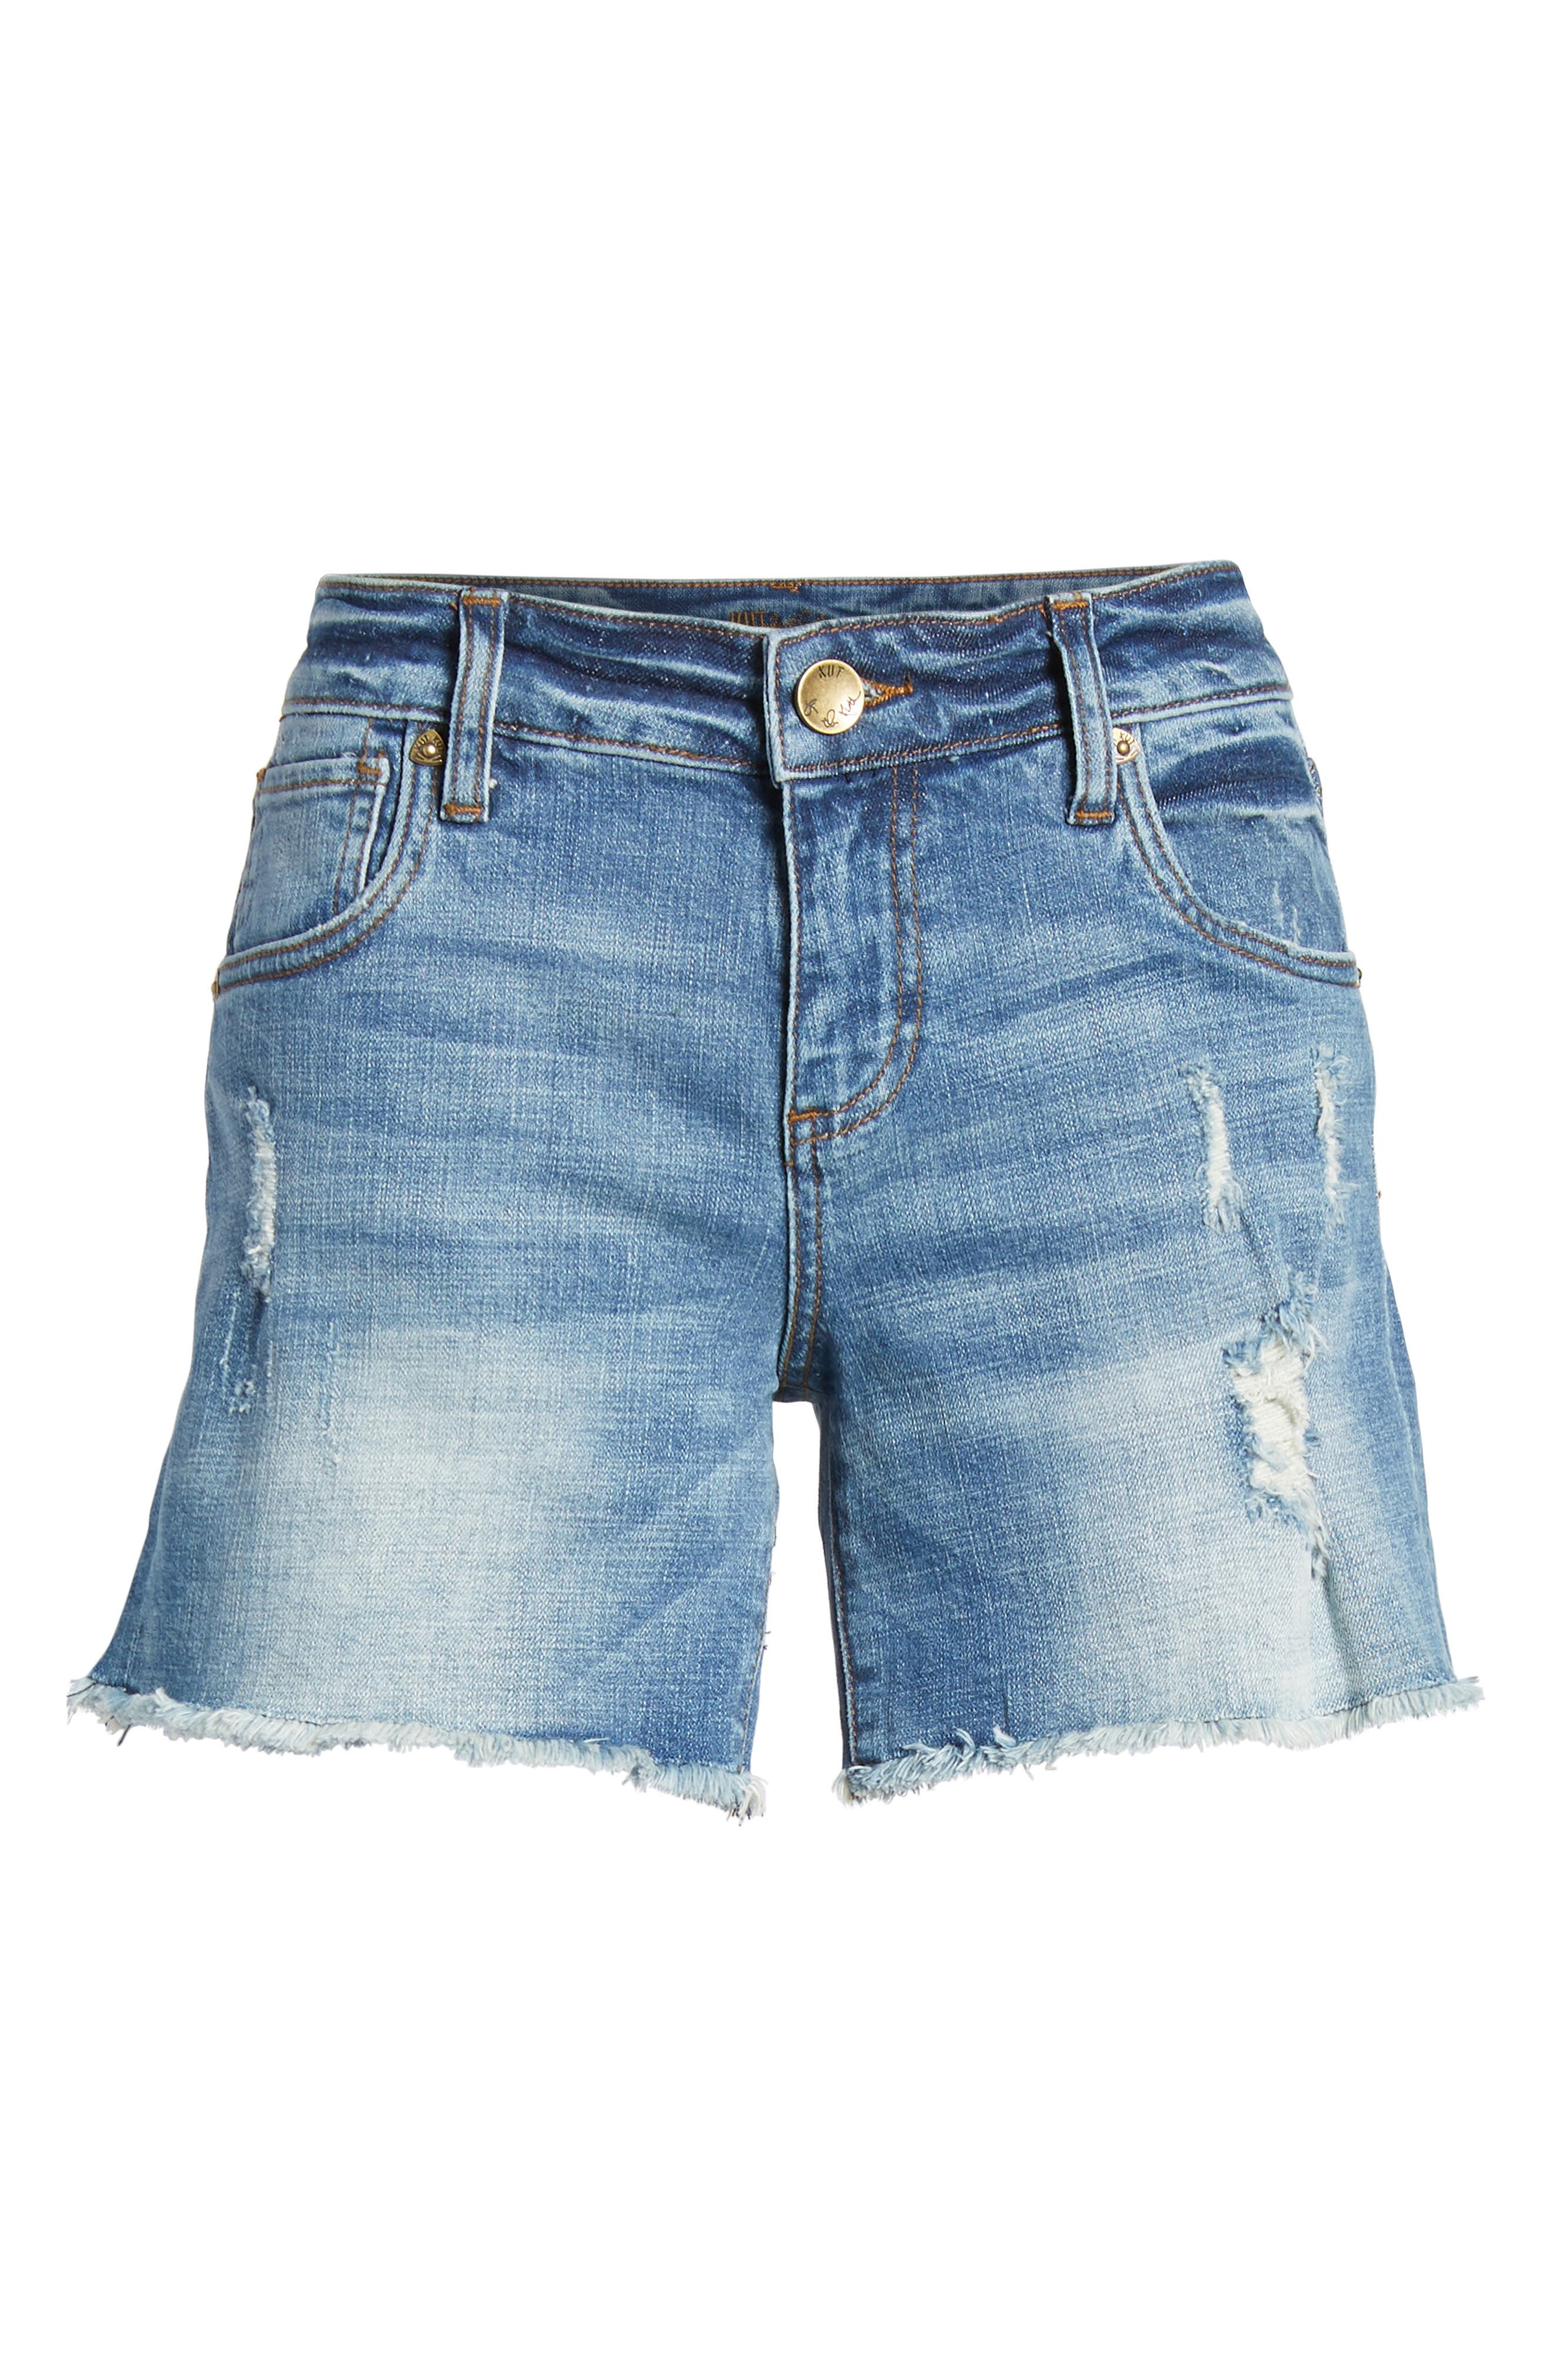 Gidget Distressed Denim Shorts,                             Alternate thumbnail 7, color,                             475